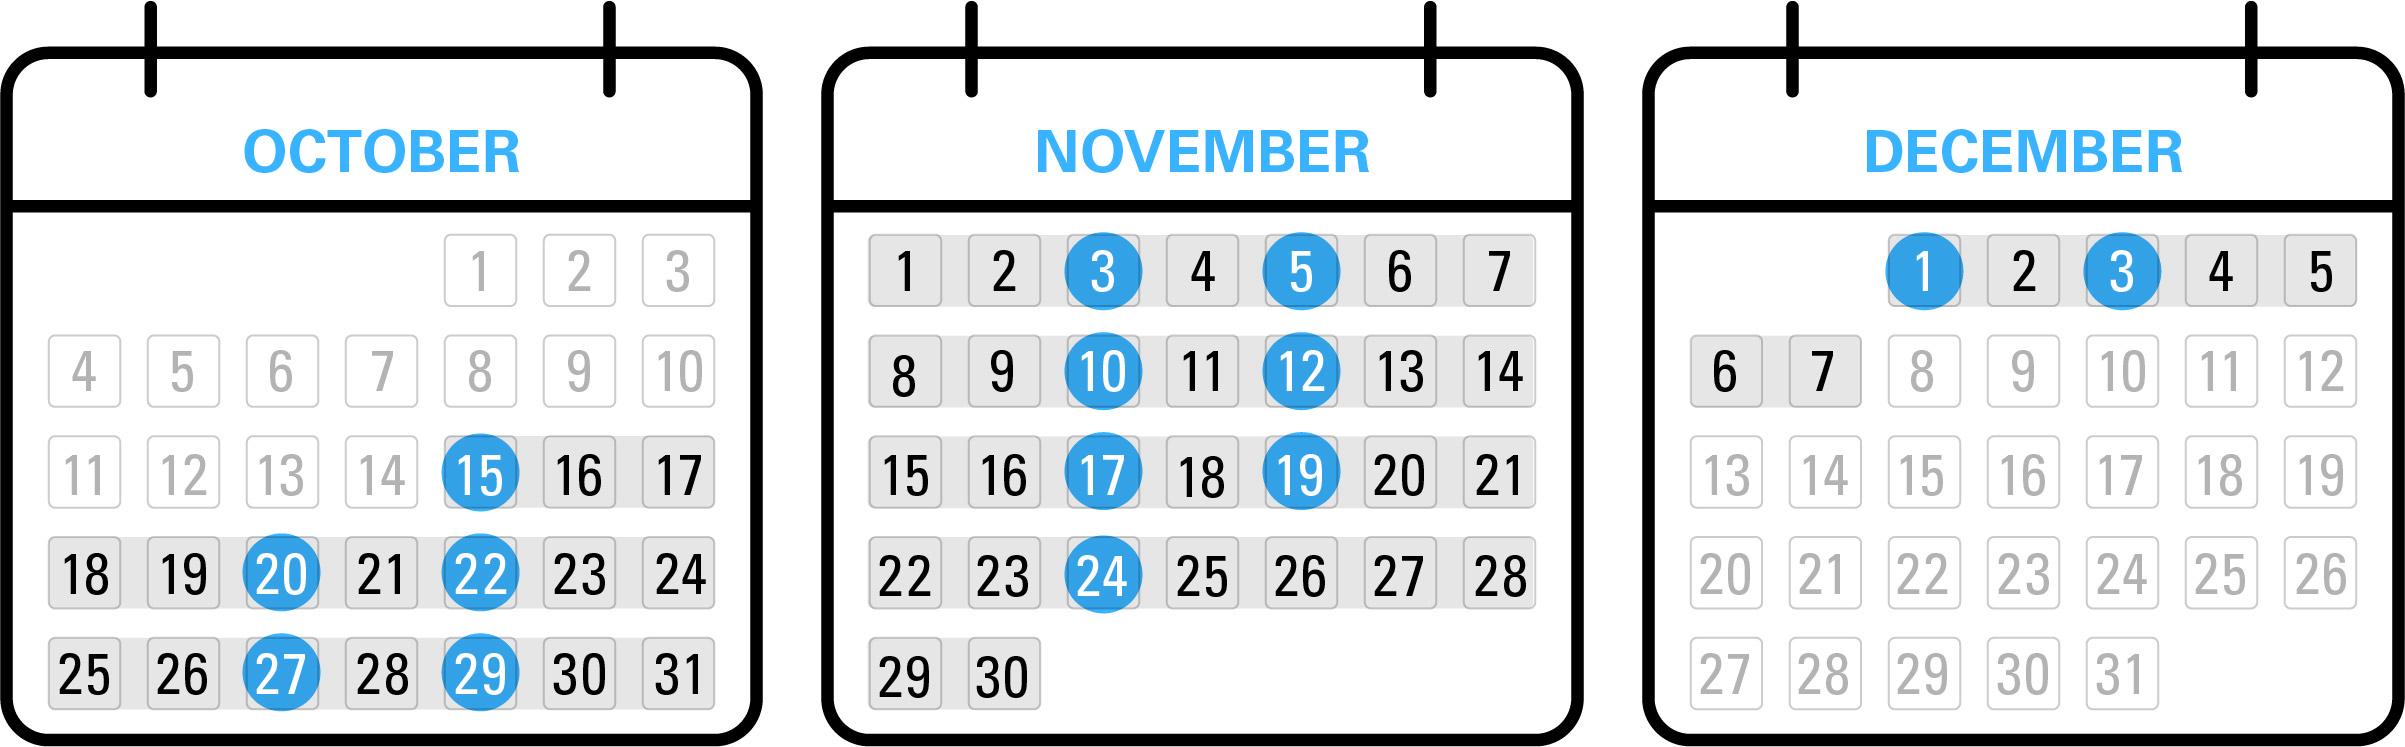 Medicare open enrollment calendar